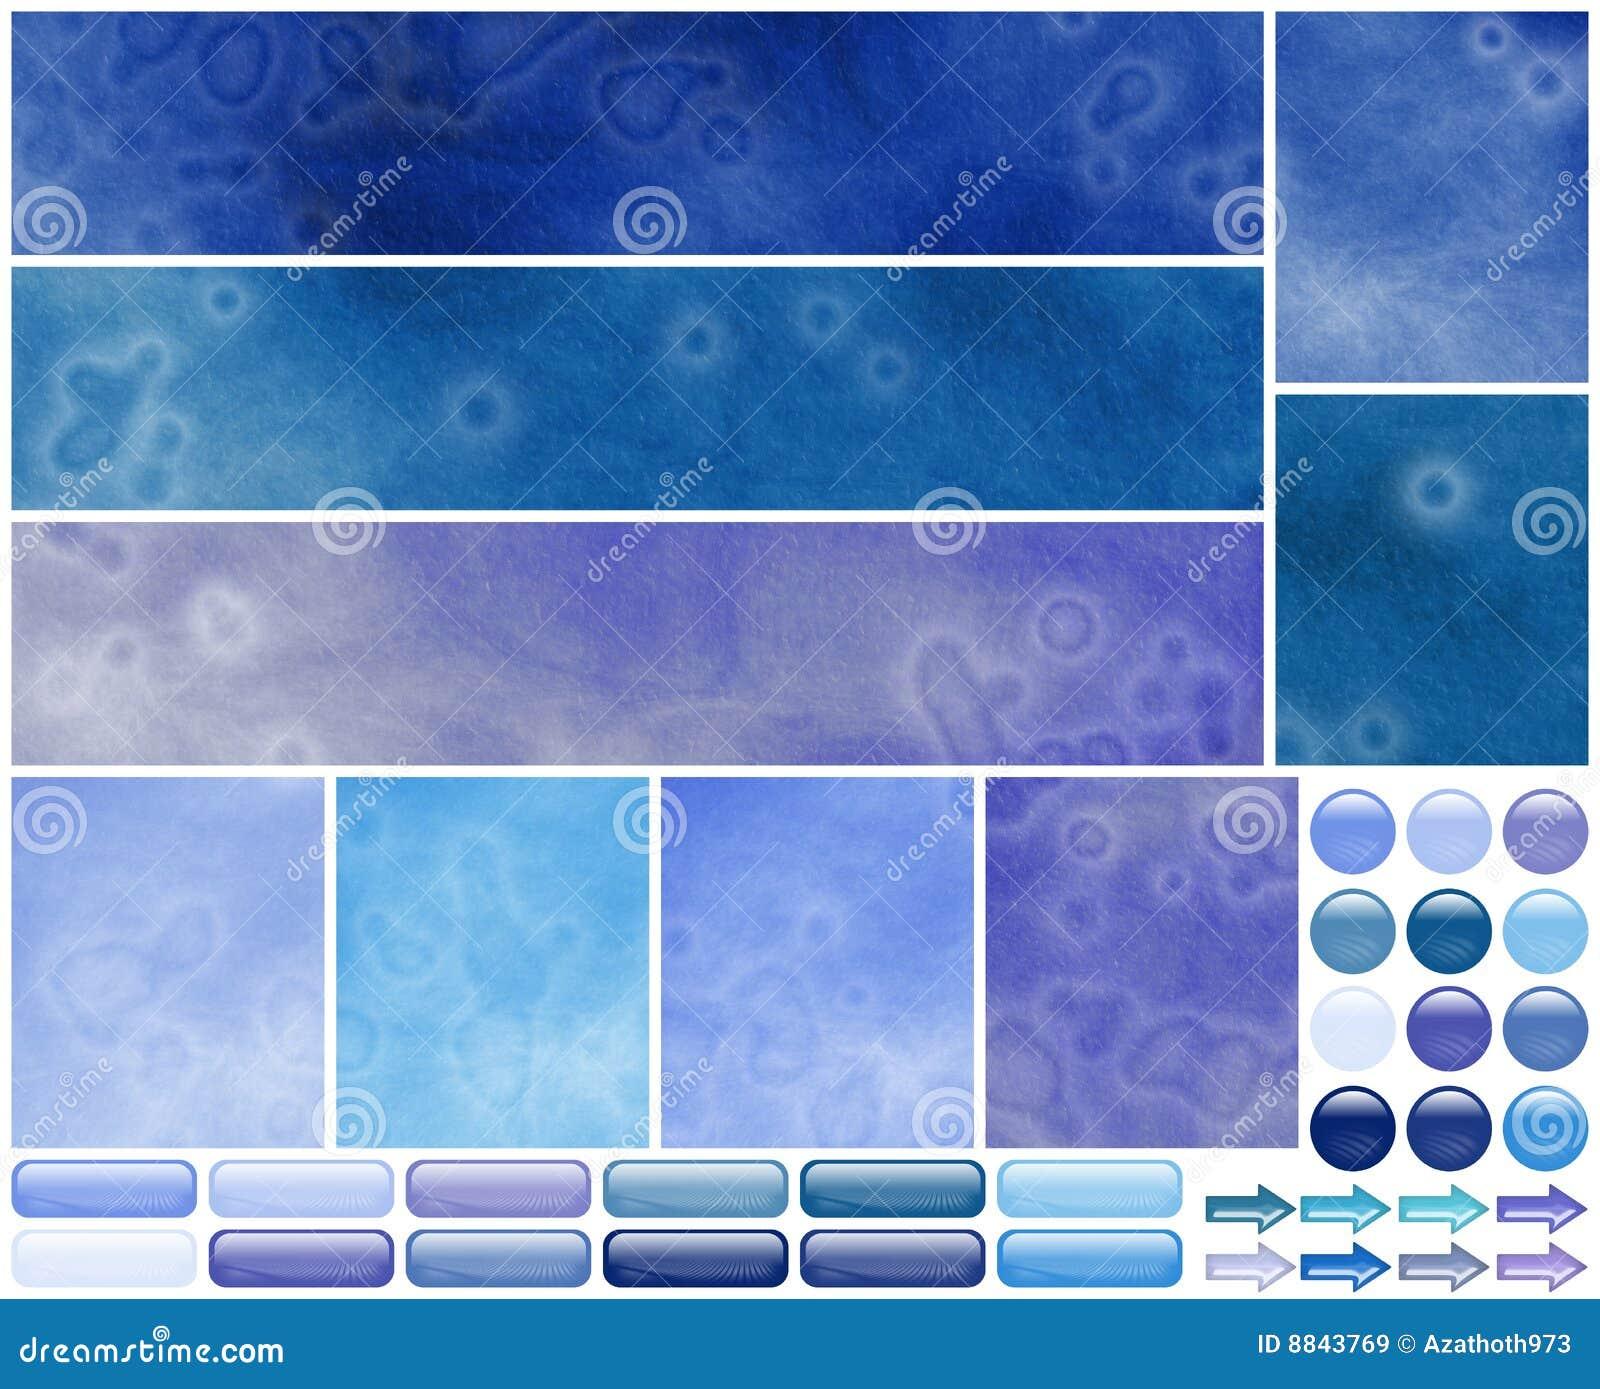 Grungy Cool Azure Violet Web Template Elements Stock Illustration